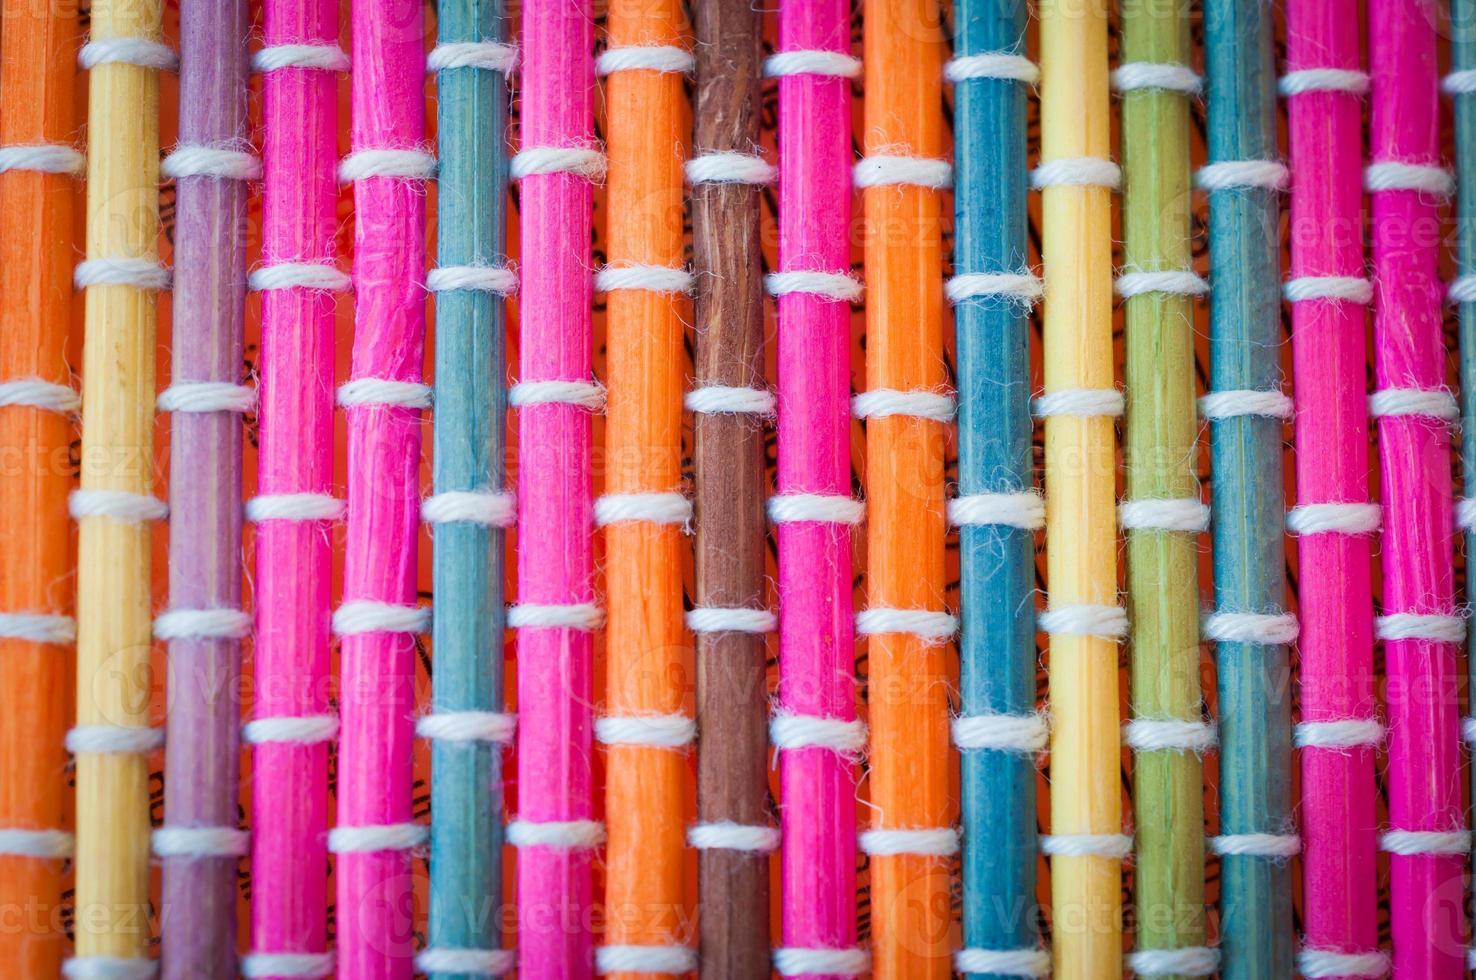 esteira de bambu, colorida foto